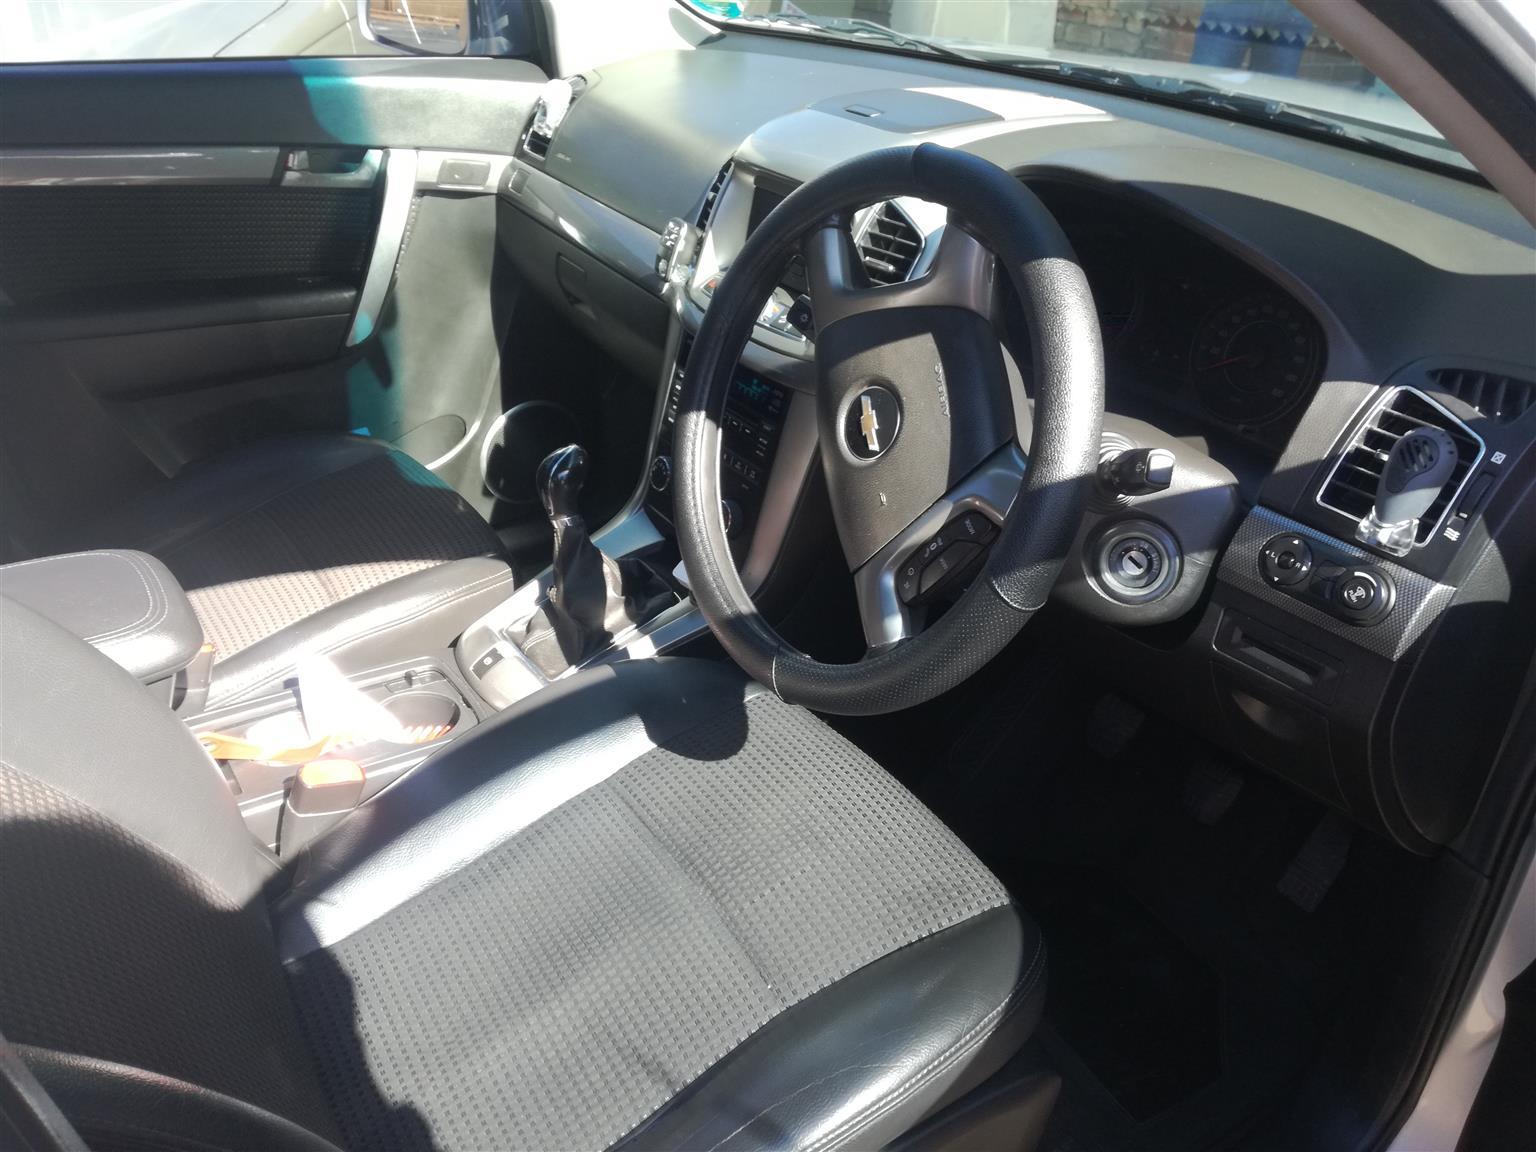 2012 Chevrolet Captiva 2.0D LTZ